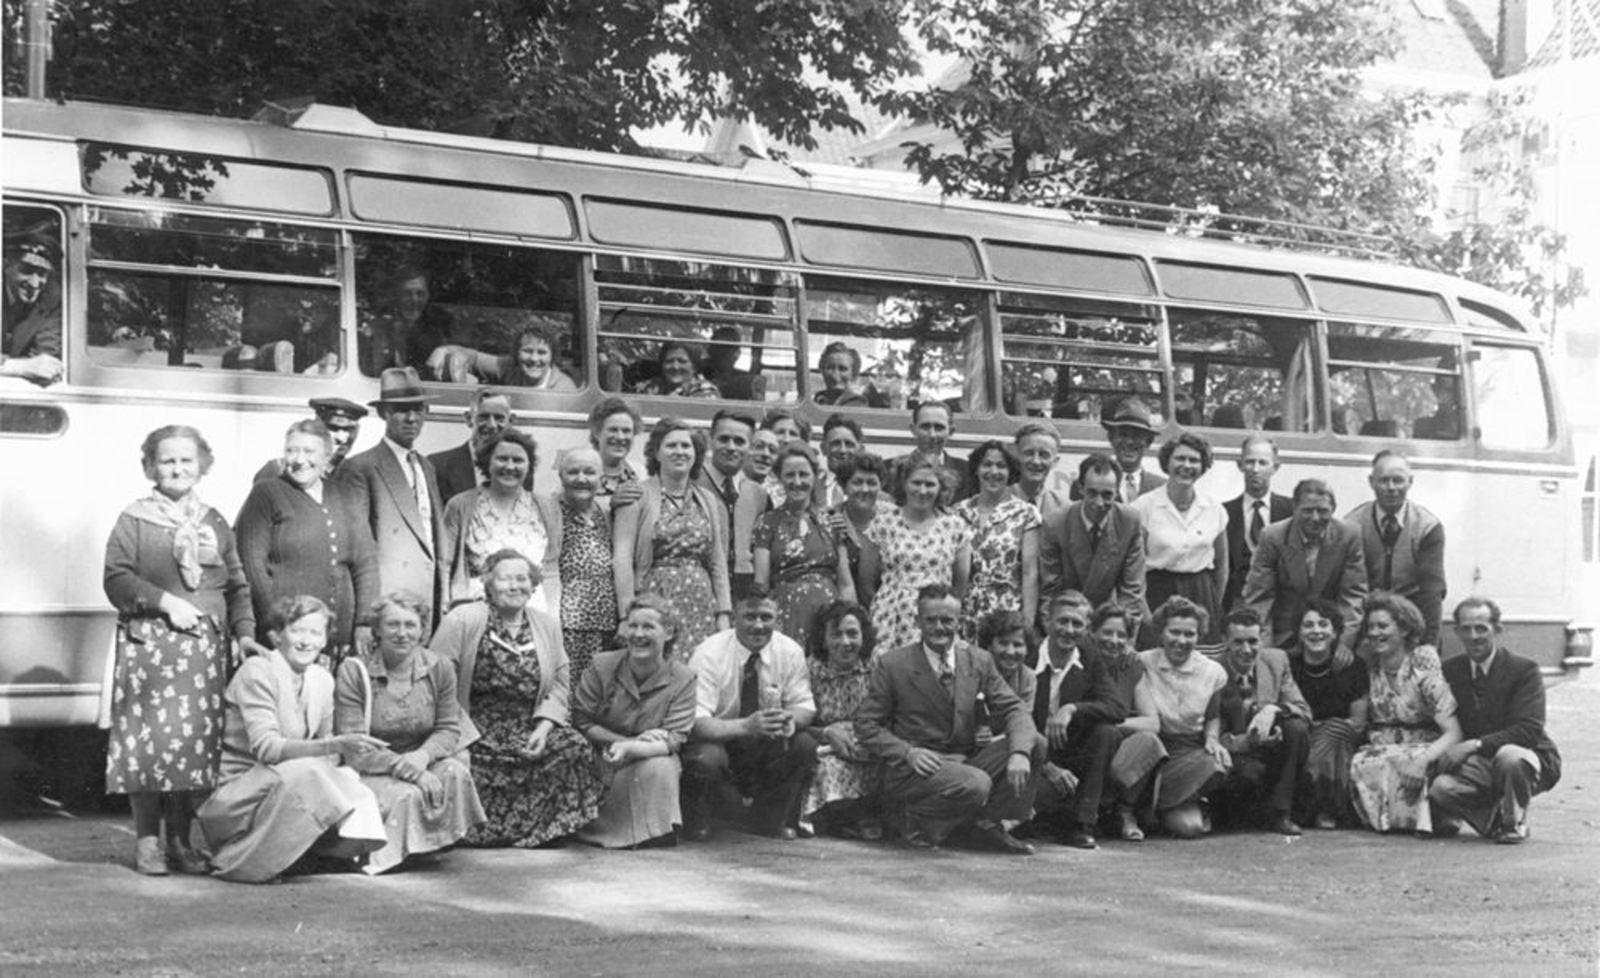 Imanse - Bliek Leentje 1920 19__ Uitje met de Reisvereniging